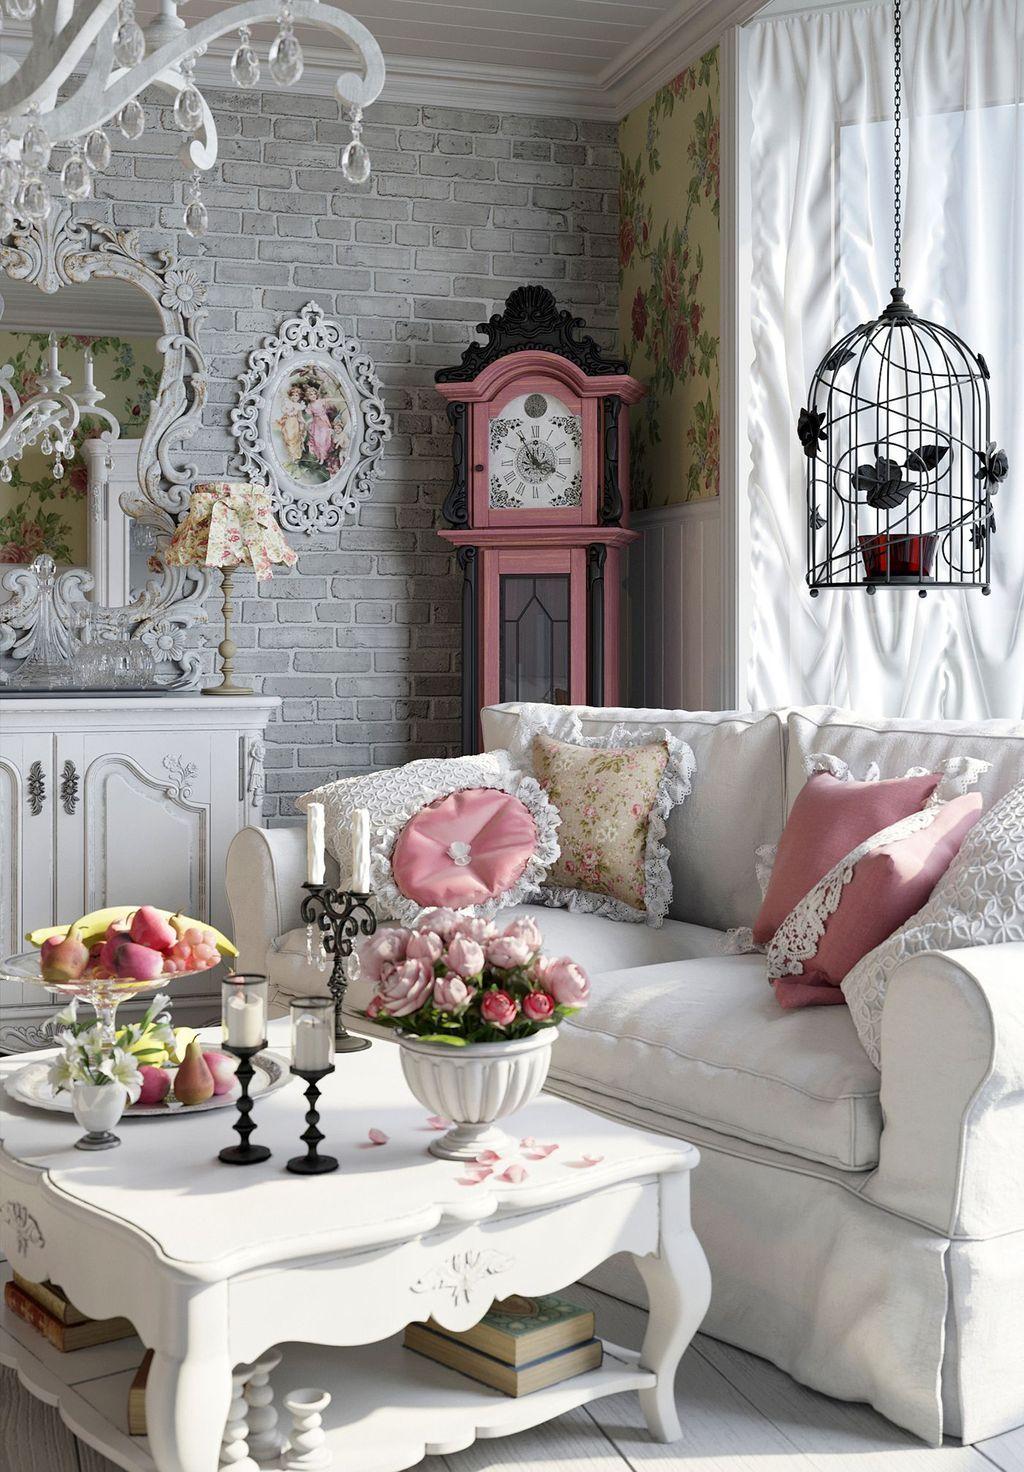 43 Inspiring Shabby Chic Living Room Ideas Shabby Chic Vintage